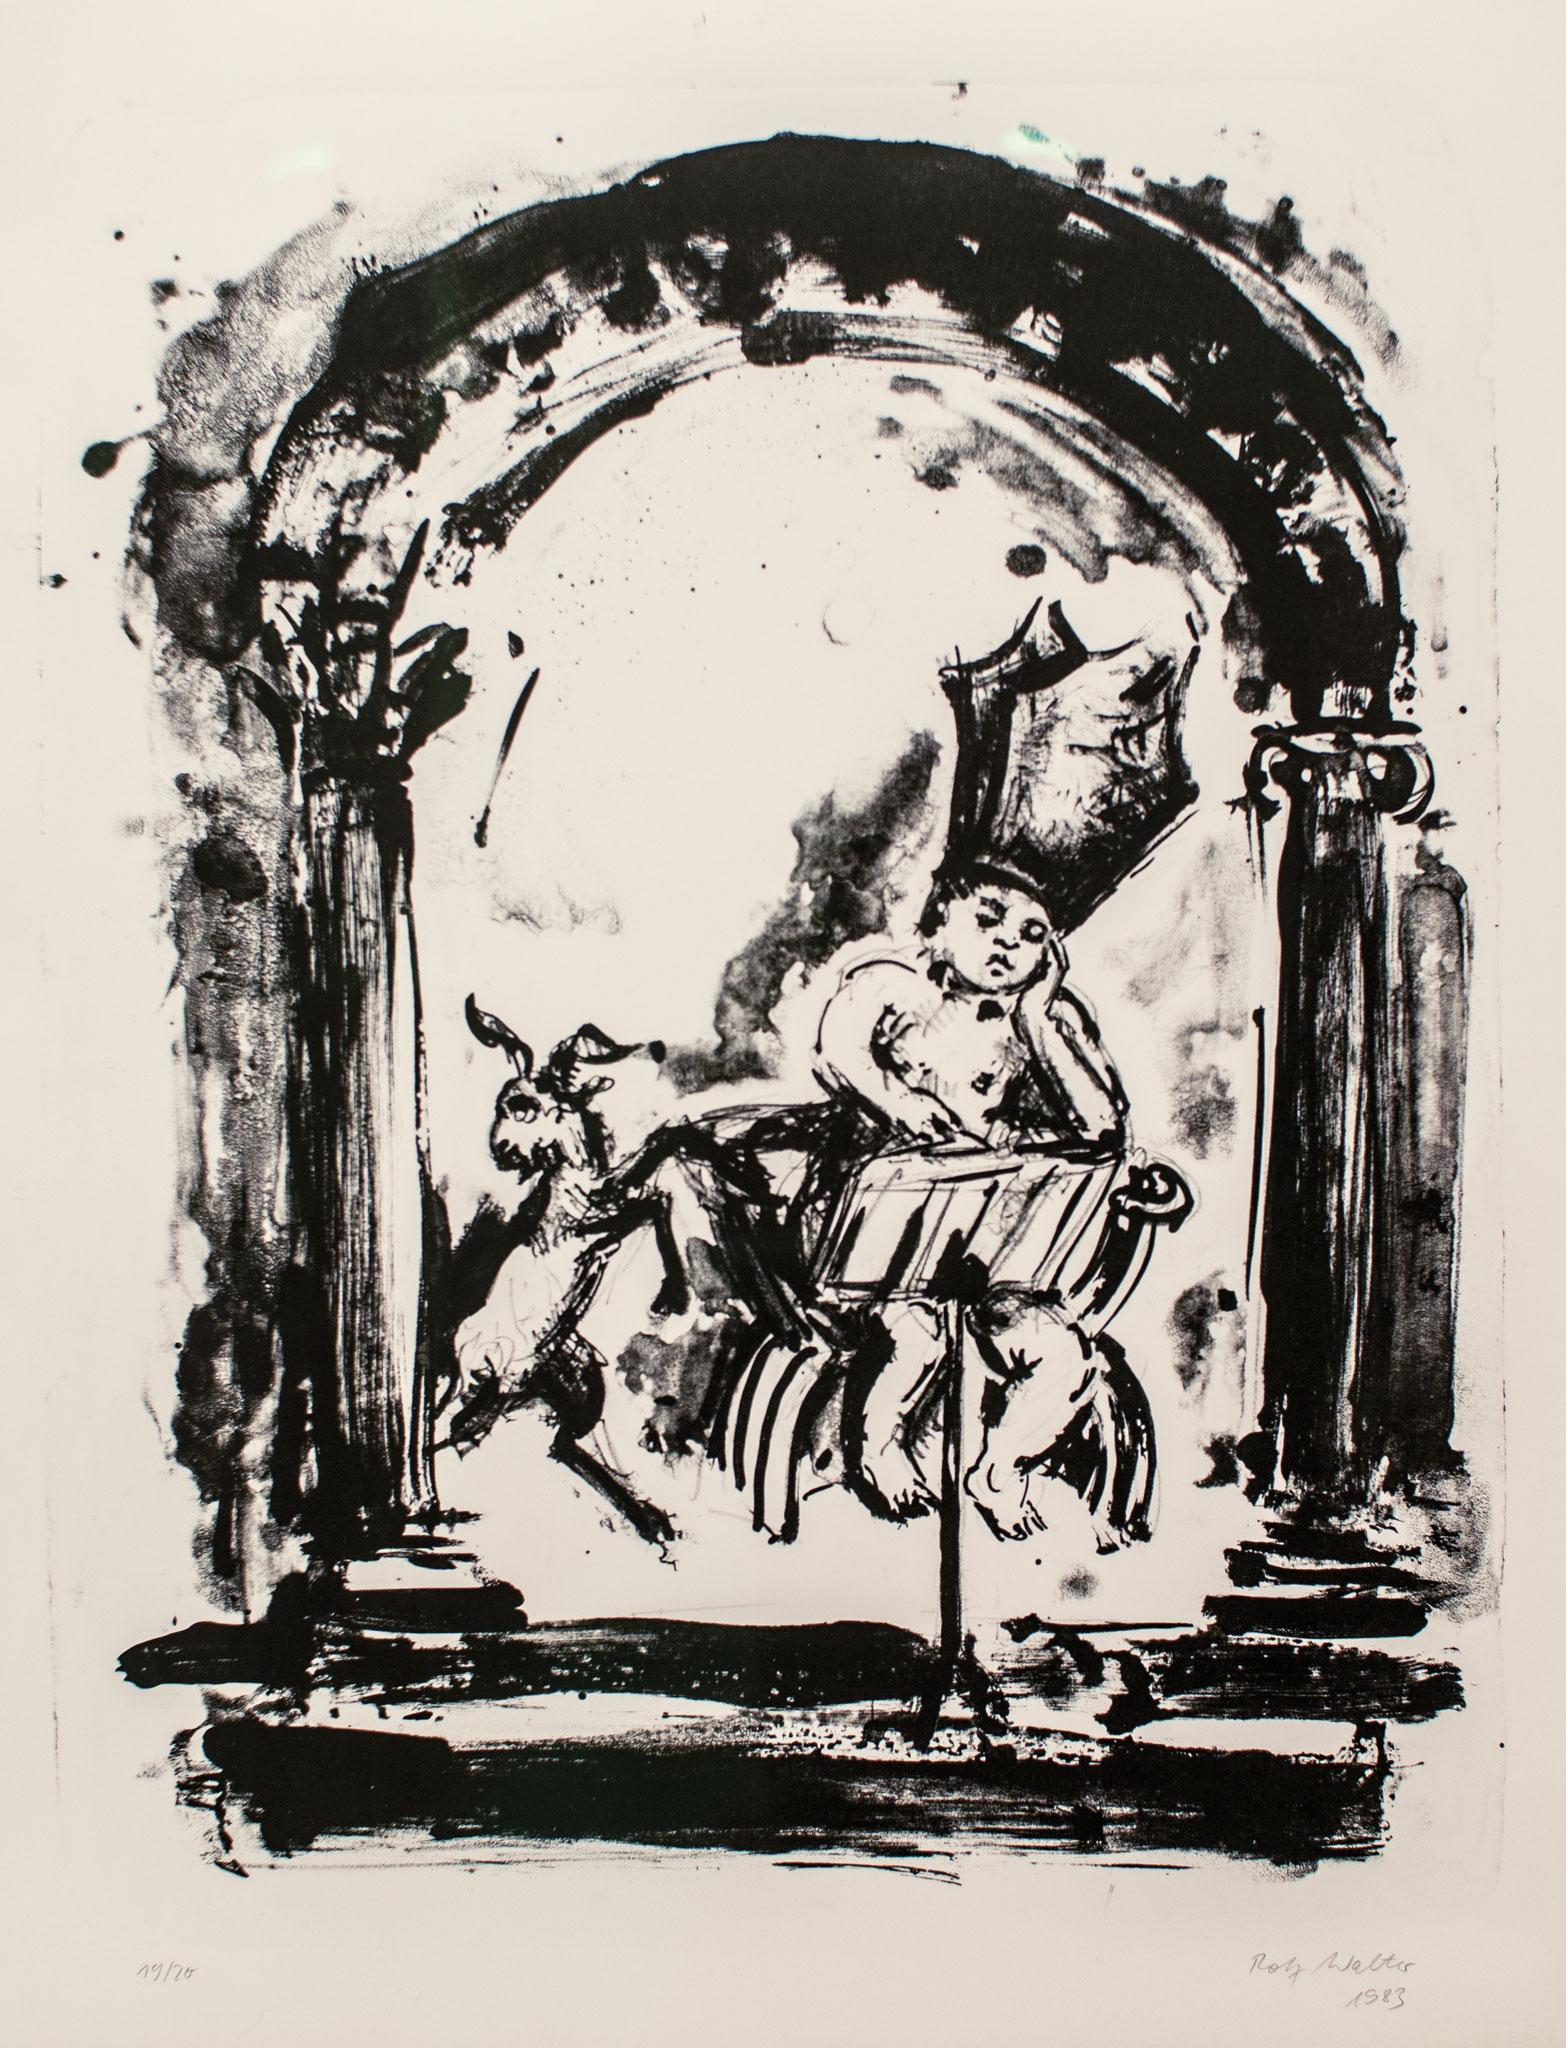 Die Lektüre, 1983, Lithographie, 48cm x 38cm